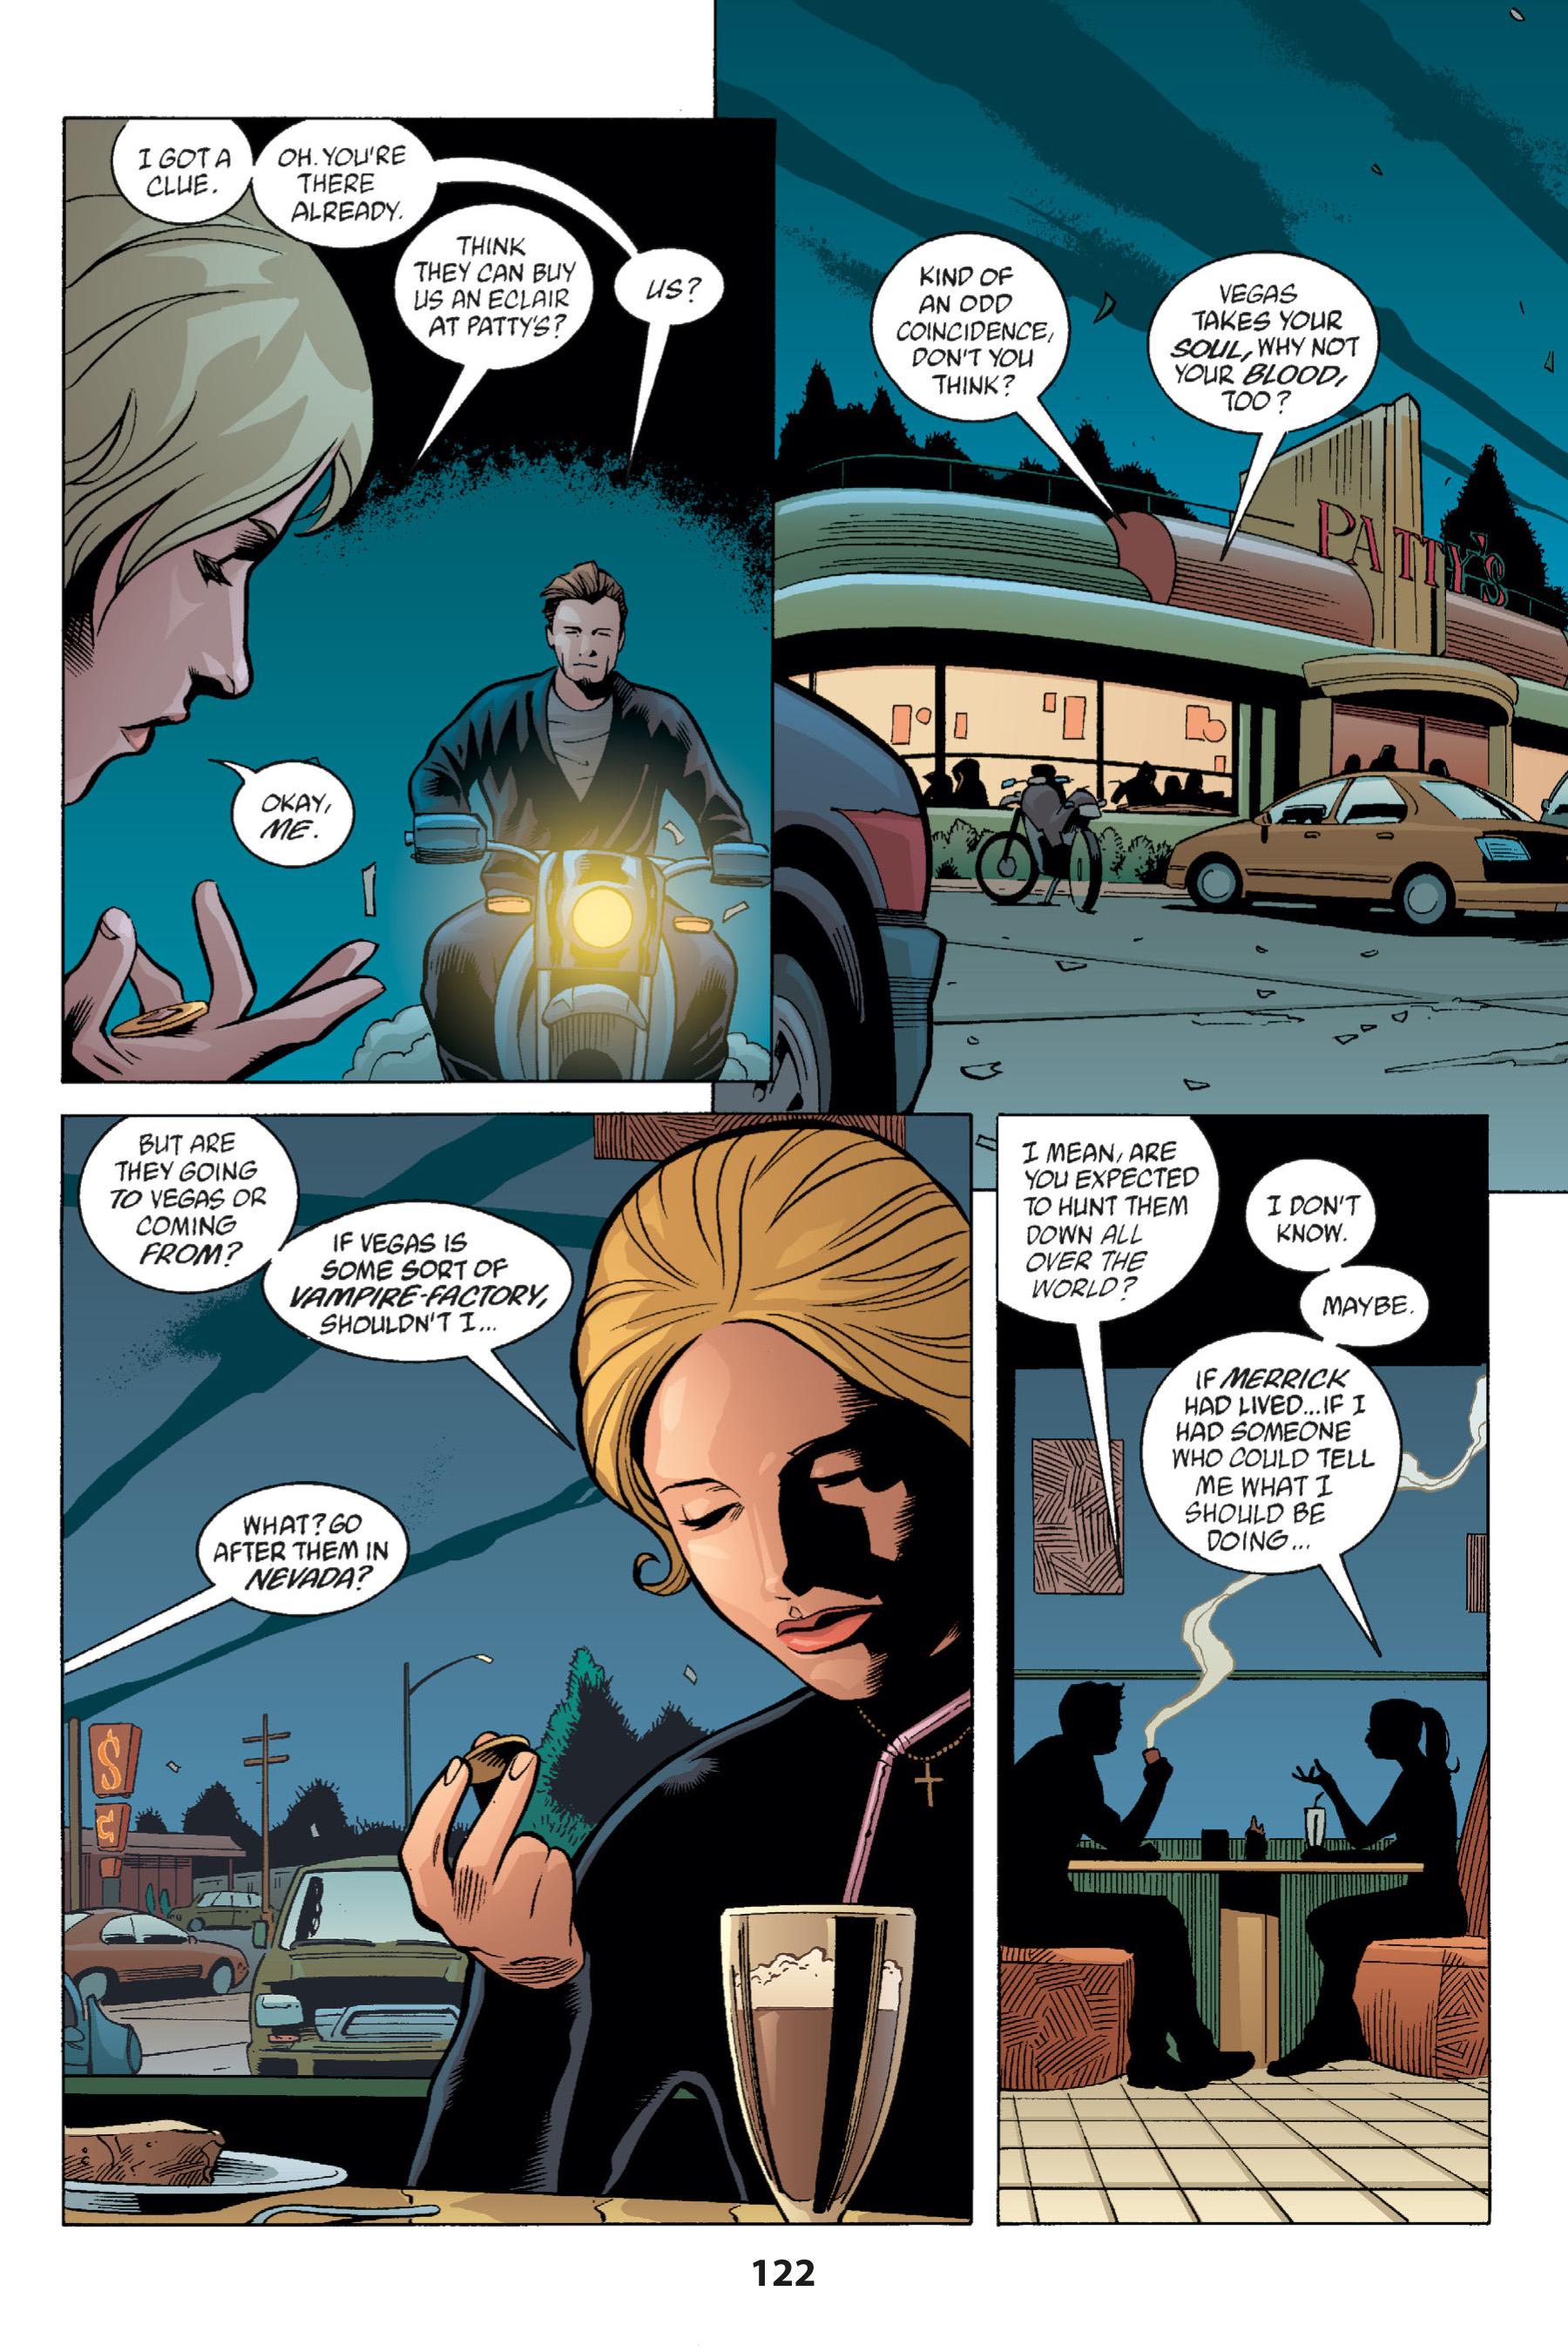 Read online Buffy the Vampire Slayer: Omnibus comic -  Issue # TPB 1 - 121